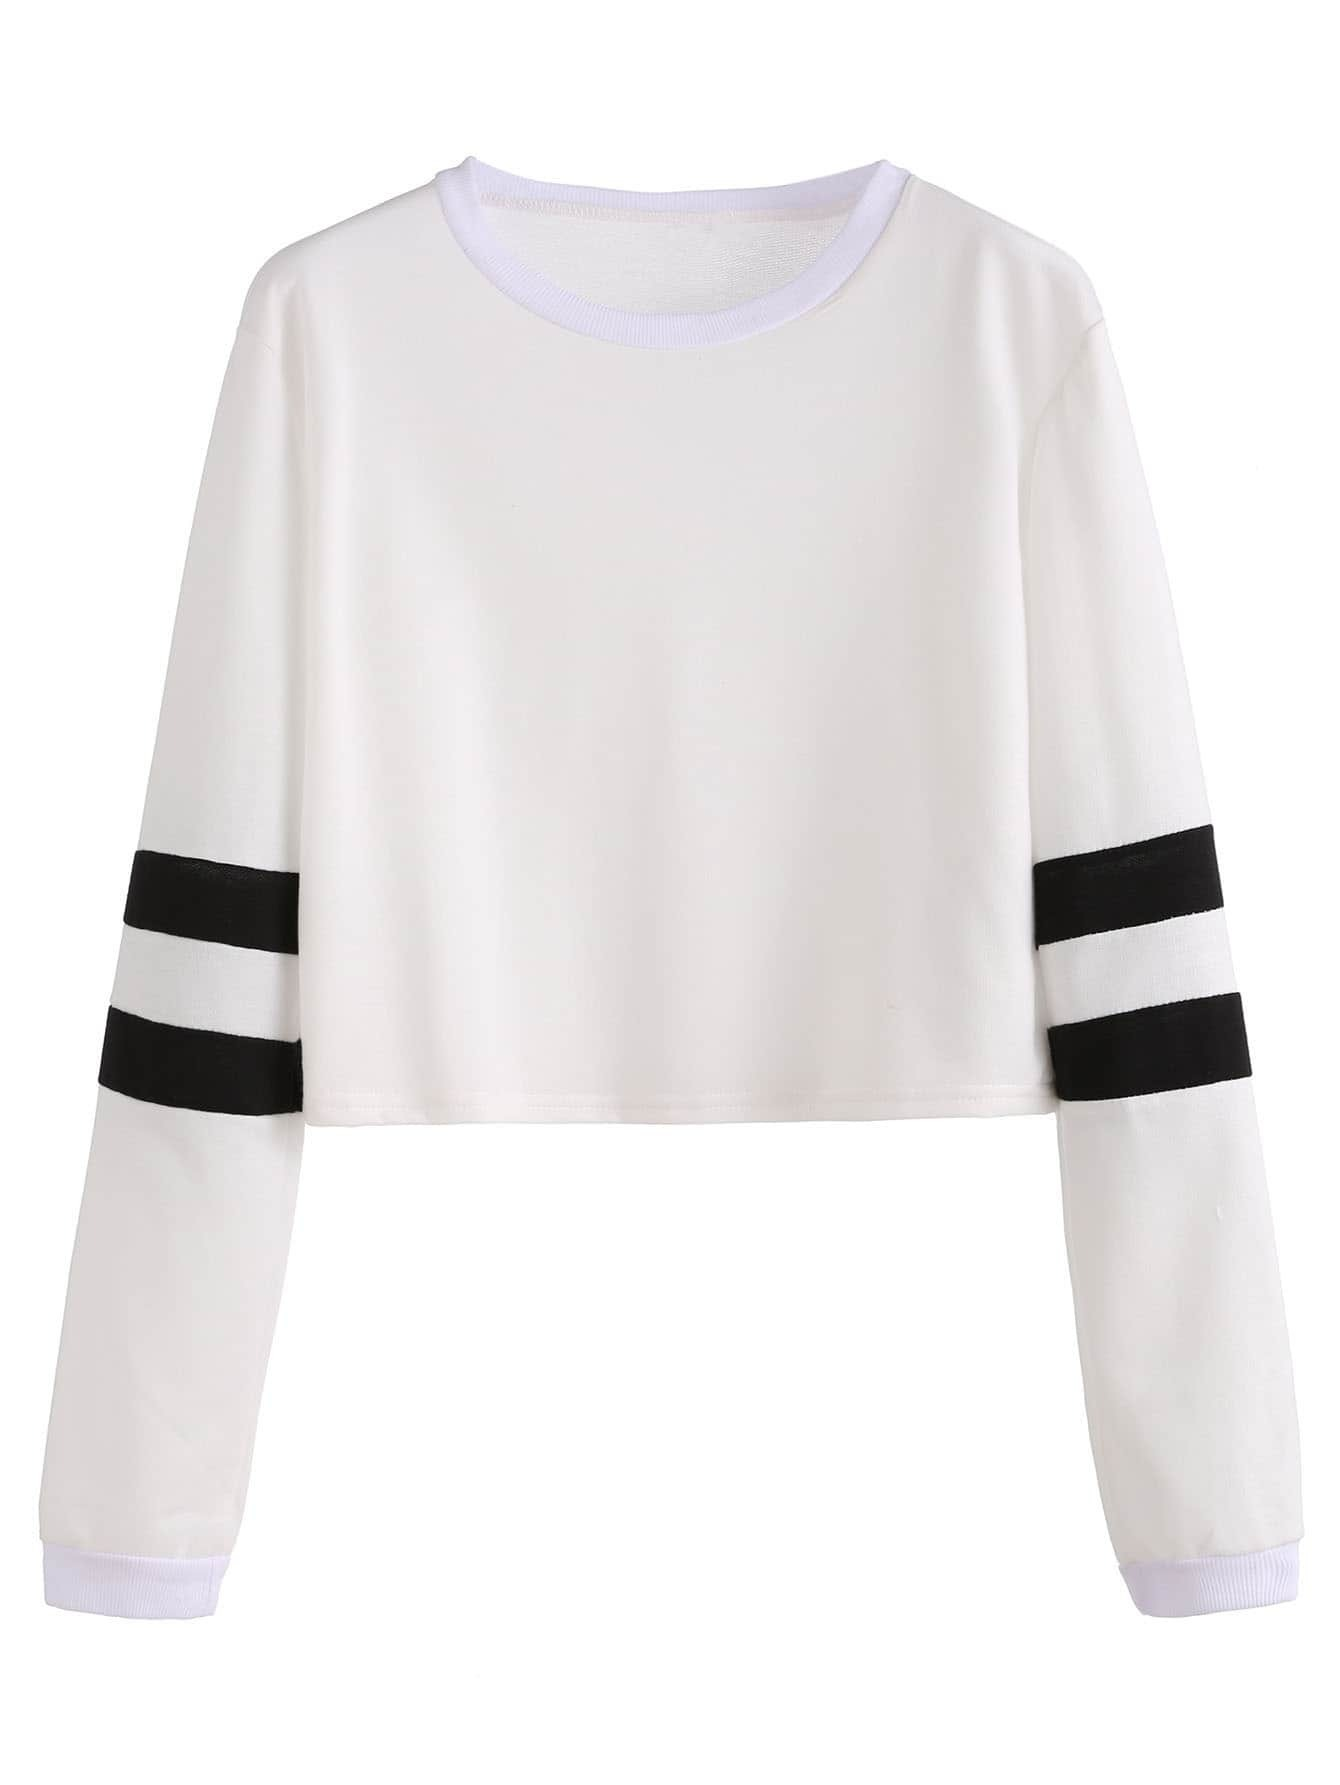 097a50f0a972a7 White Varsity Striped Sleeve Crop T-shirt EmmaCloth-Women Fast ...